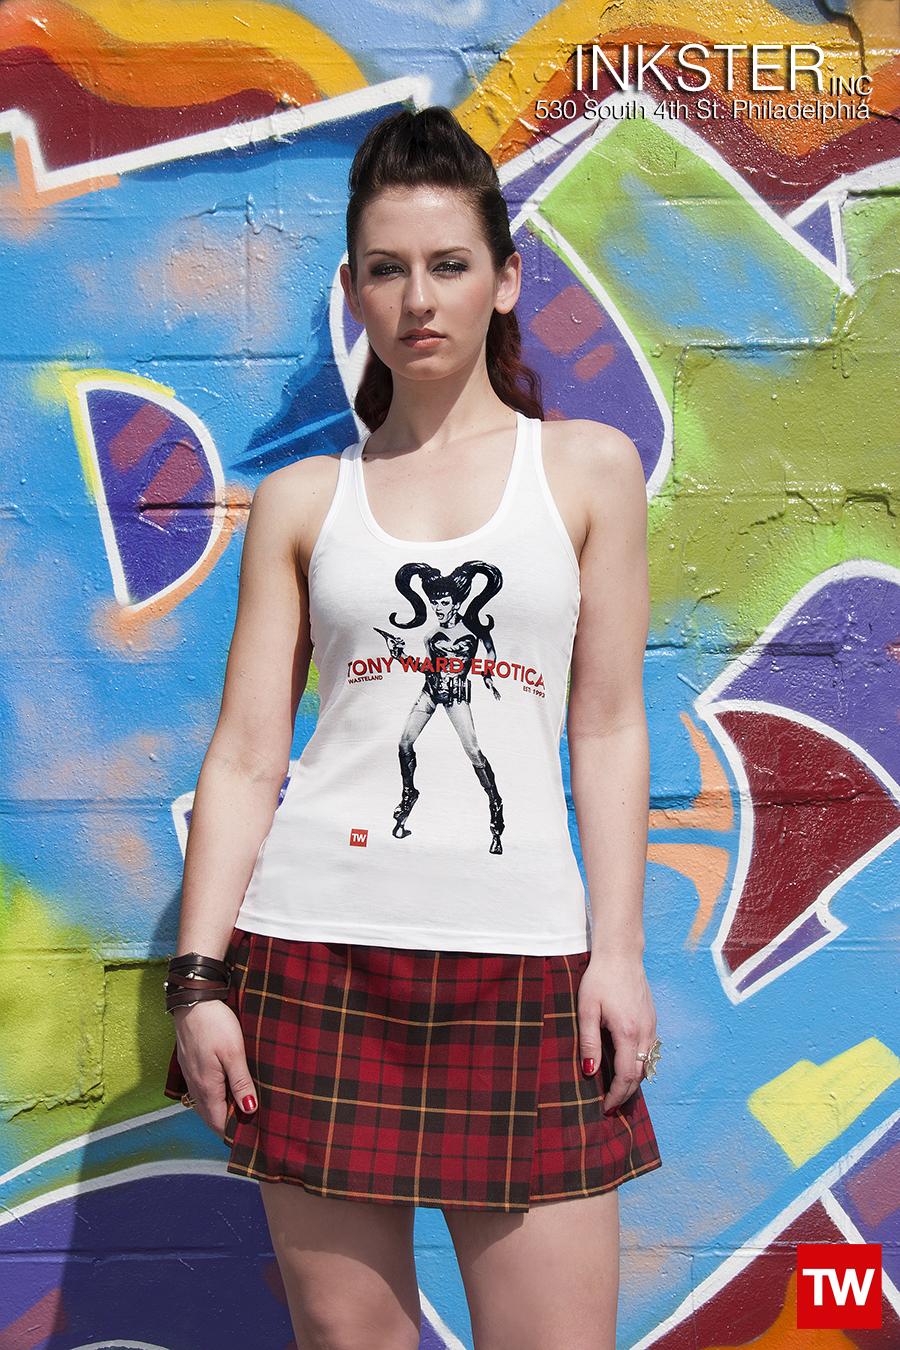 Tony_Ward_Erotica_Wasteland_t-shirt_white_racerback_model_Julia_Craig_stylist_Mindy_Chandler_grafitti_walls_philly_cecil_b_moore_fashion_traditional_kilt